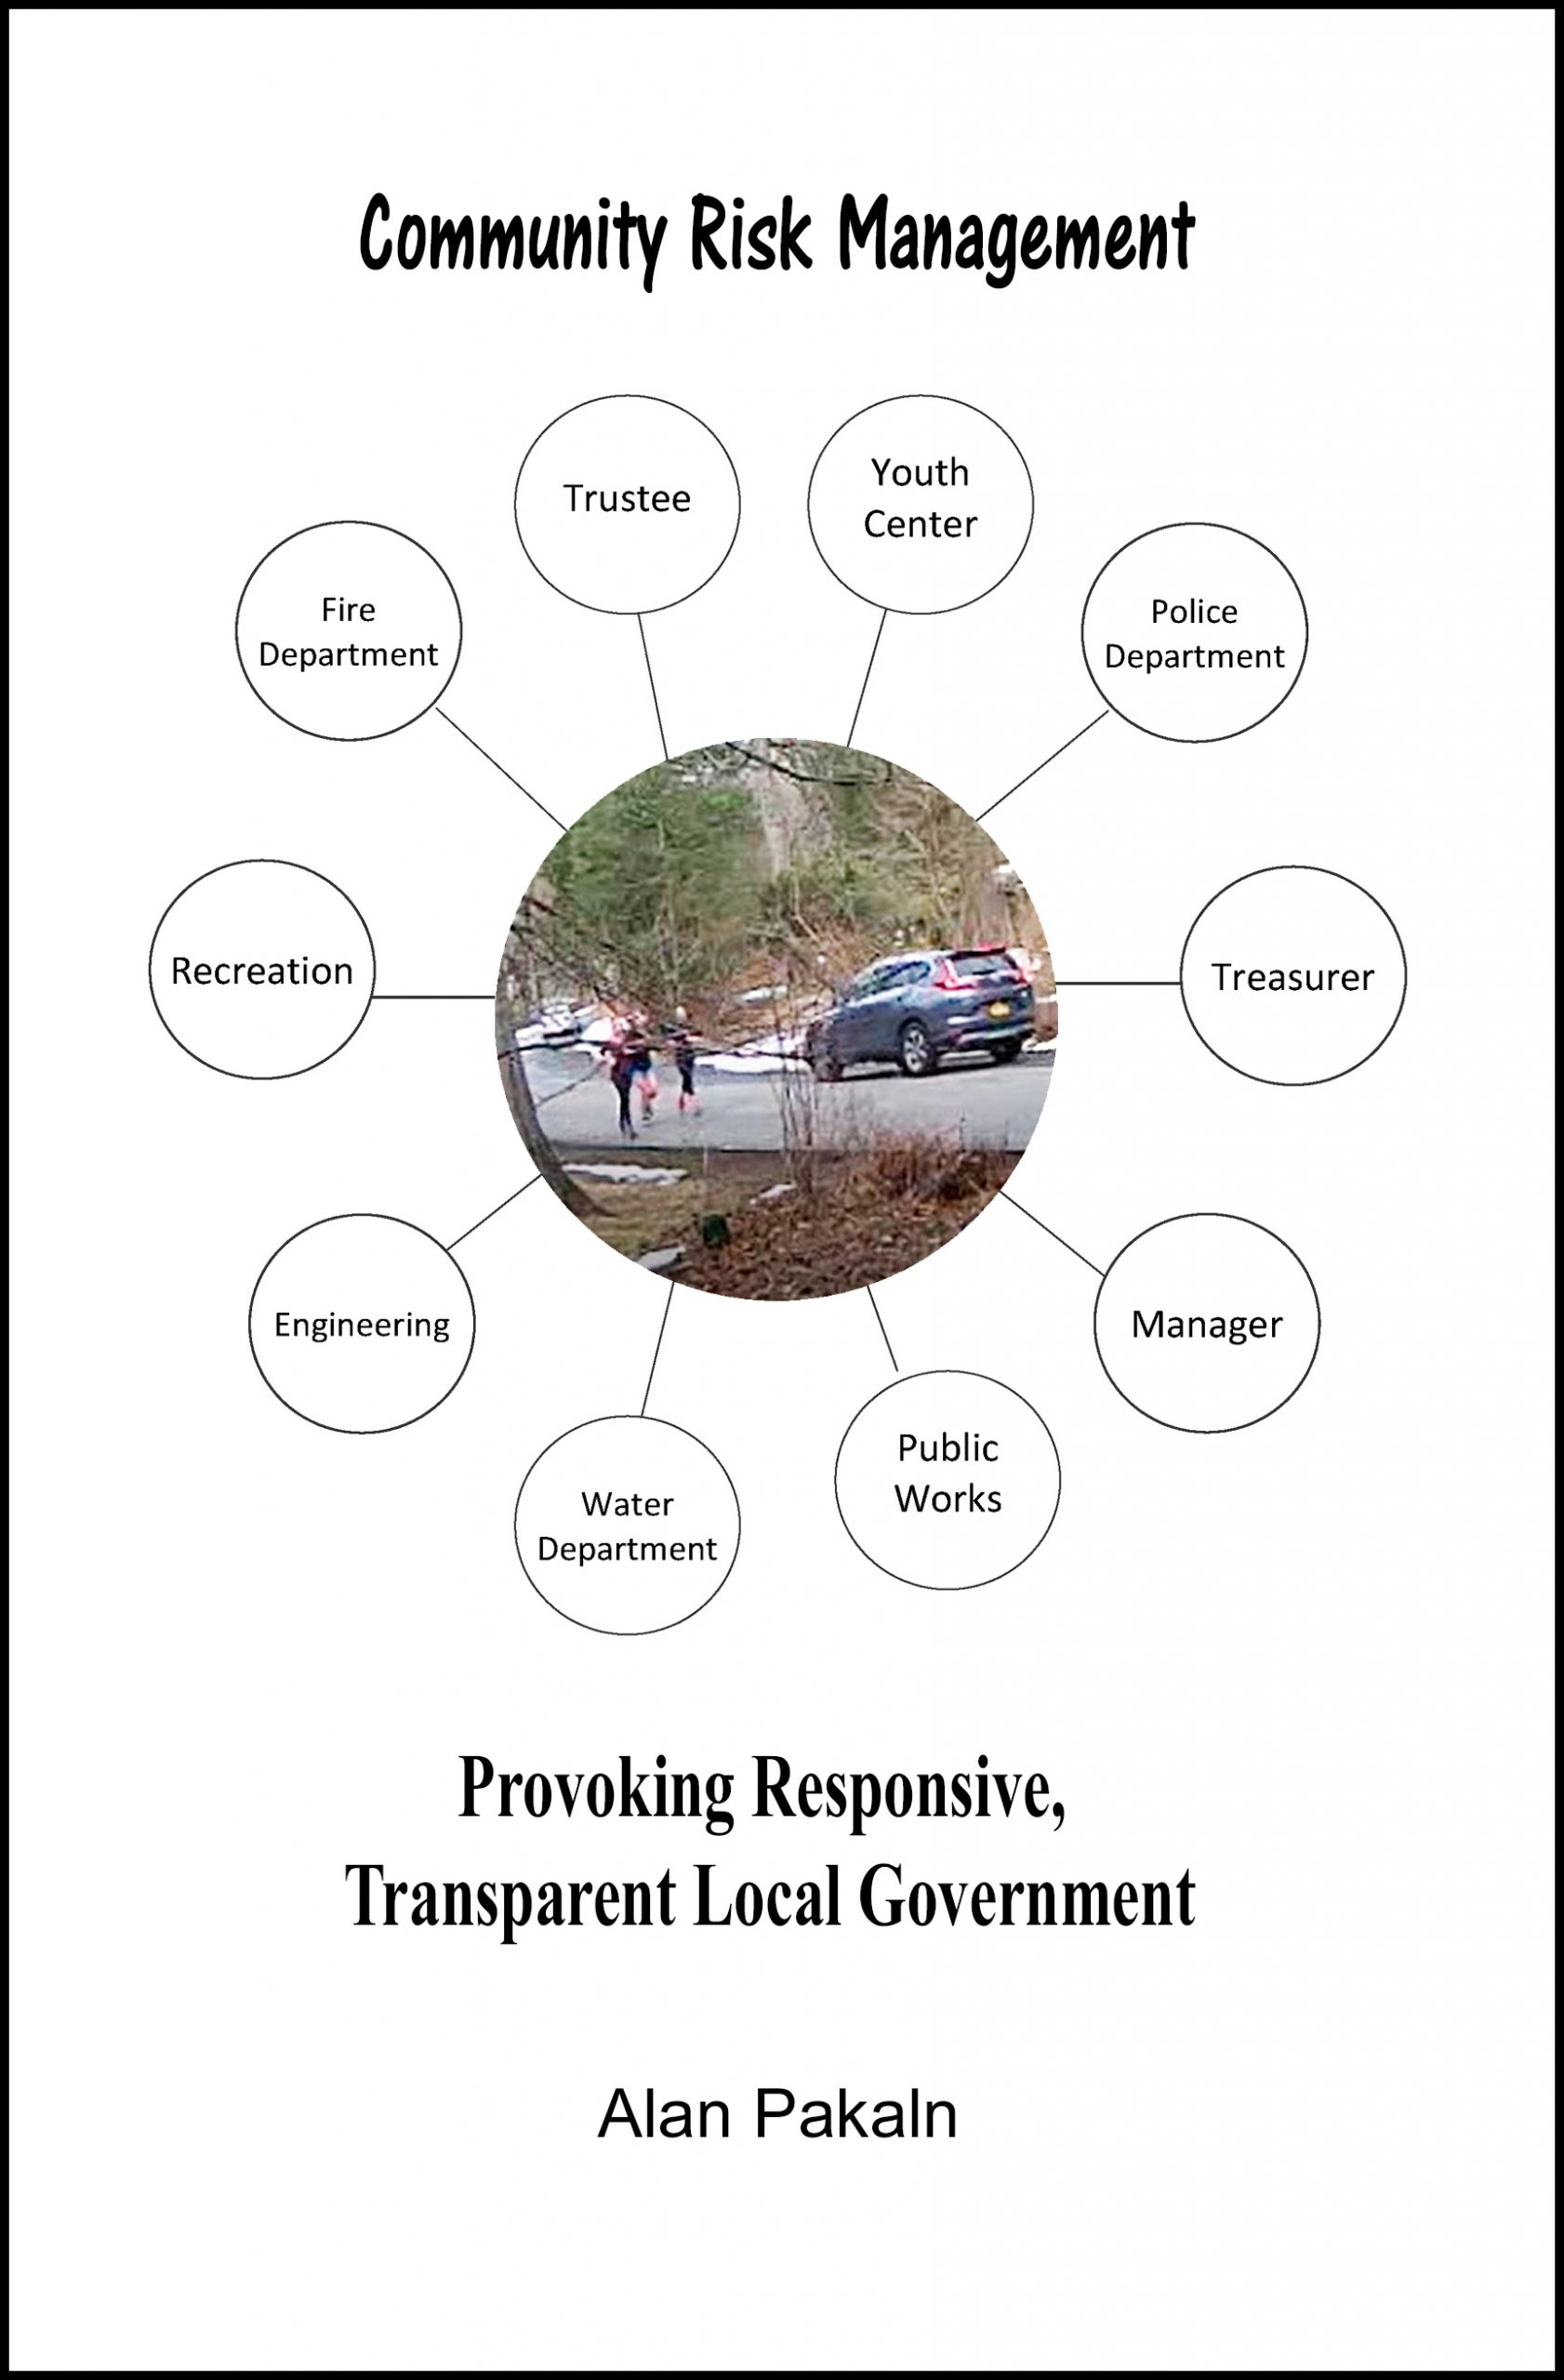 Book promoting community risk management, current